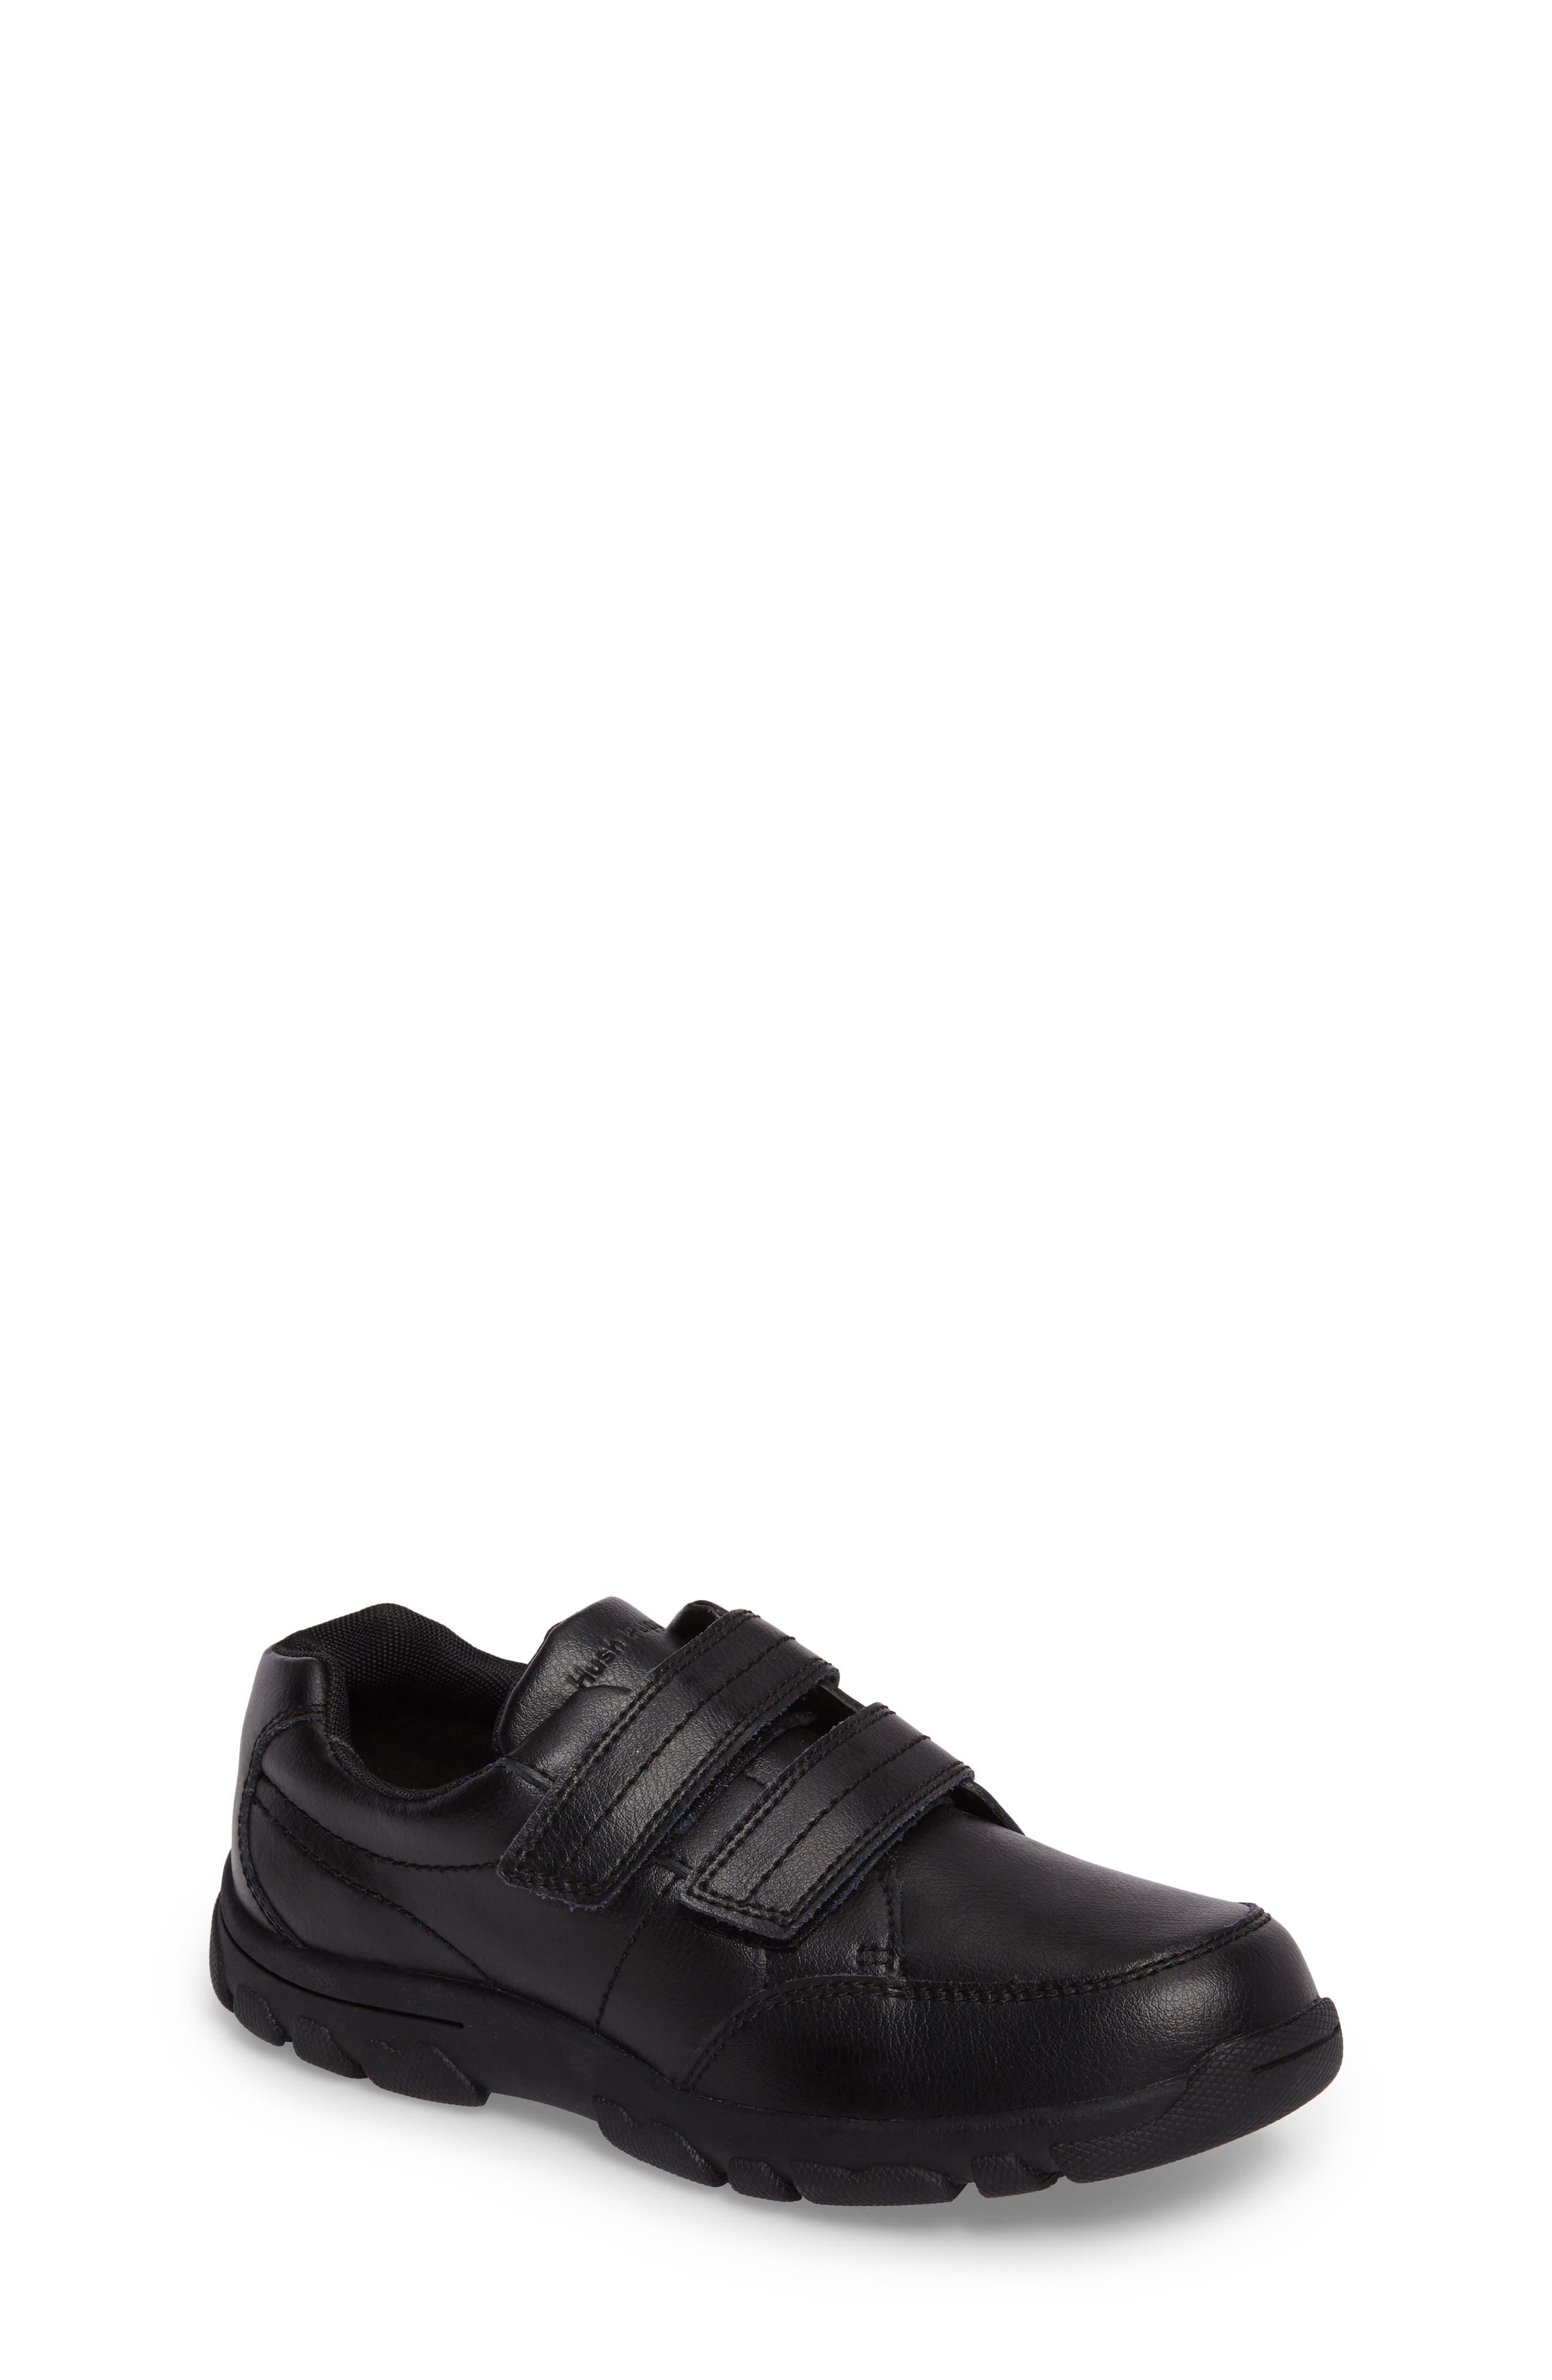 Jace Dress Sneaker,                             Main thumbnail 1, color,                             BLACK LEATHER